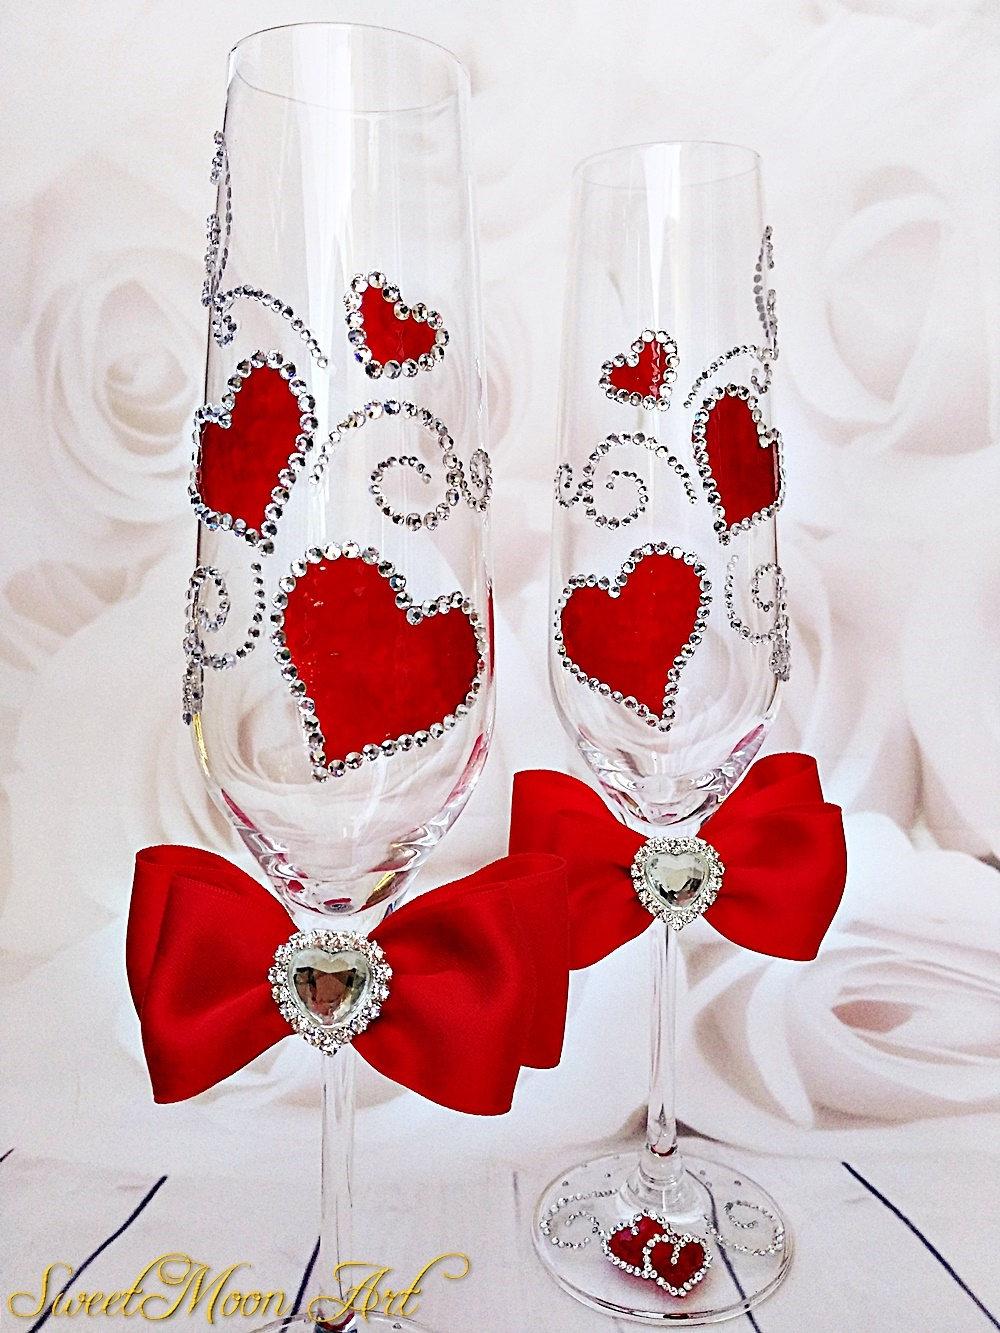 Copas Champagne Rojas Flutas Boda Rojas Flautas Champagne # Champagne Muebles Uy